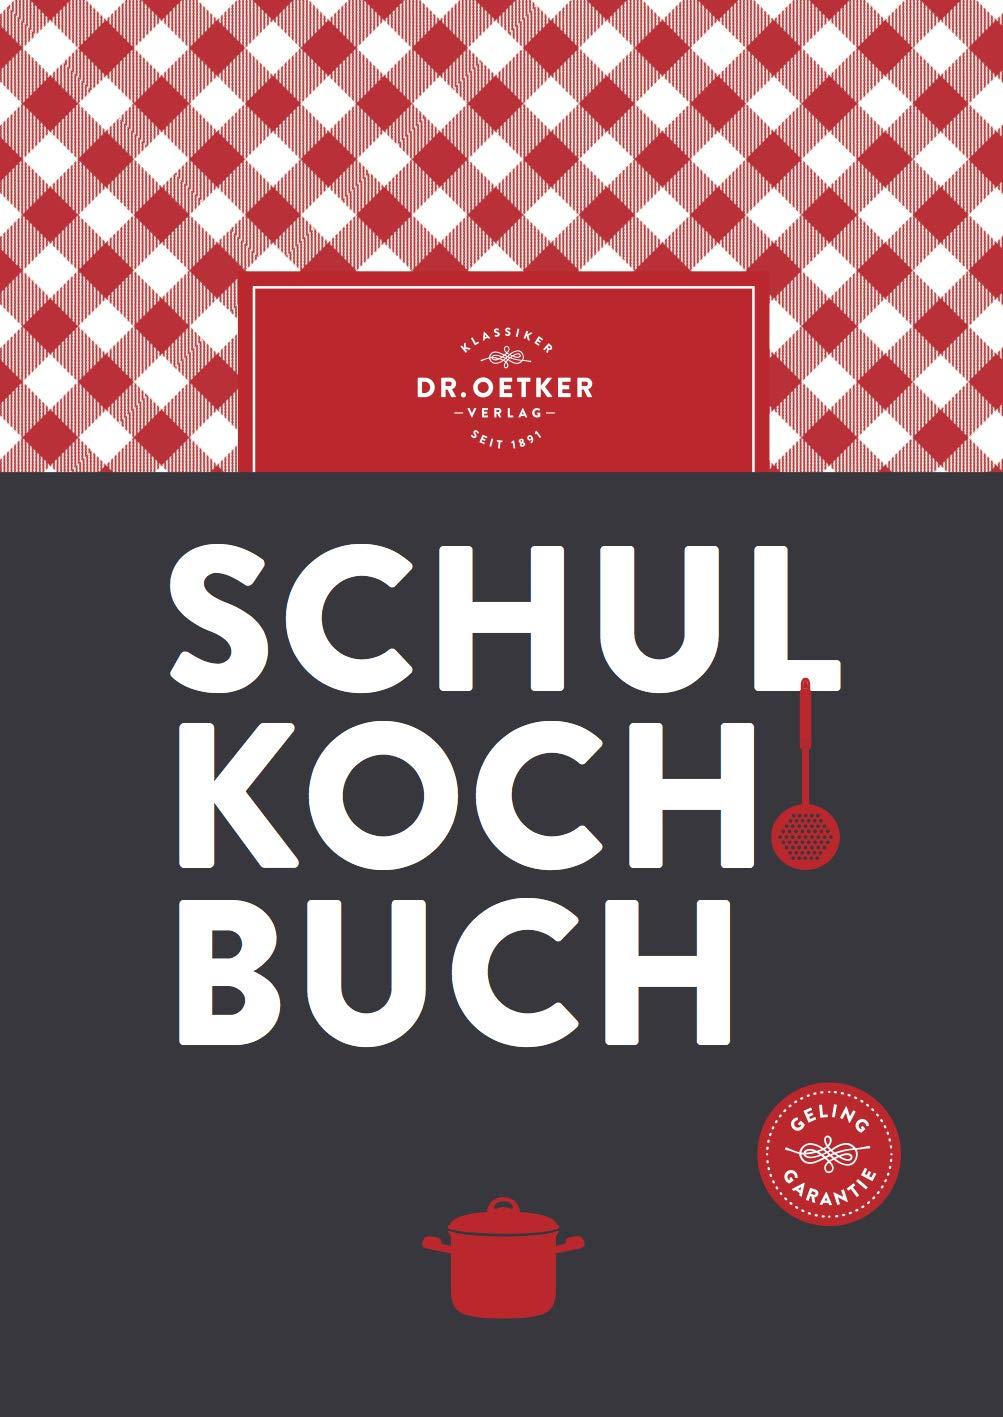 Dr. Oetker Schulkochbuch Gebundenes Buch – 9. April 2018 3767016583 Allg. Kochbücher Grundkochbücher Kochen / Allgemeines Kochbuch